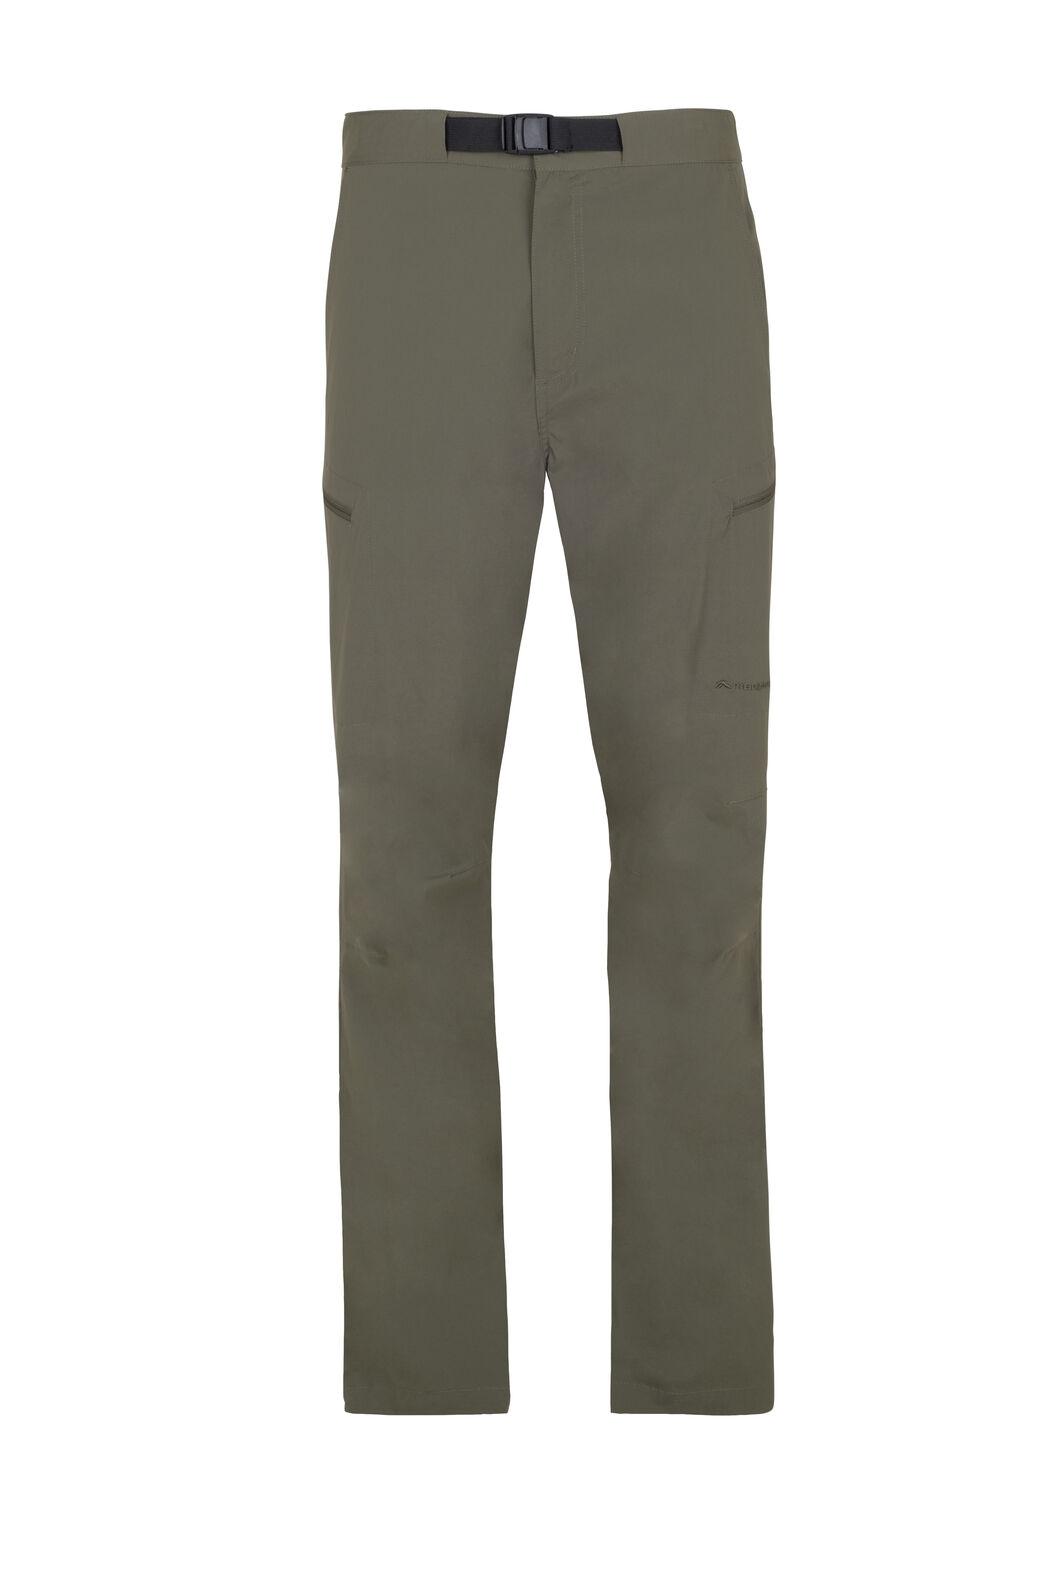 Macpac Drift Pants - Men's, Grape Leaf, hi-res